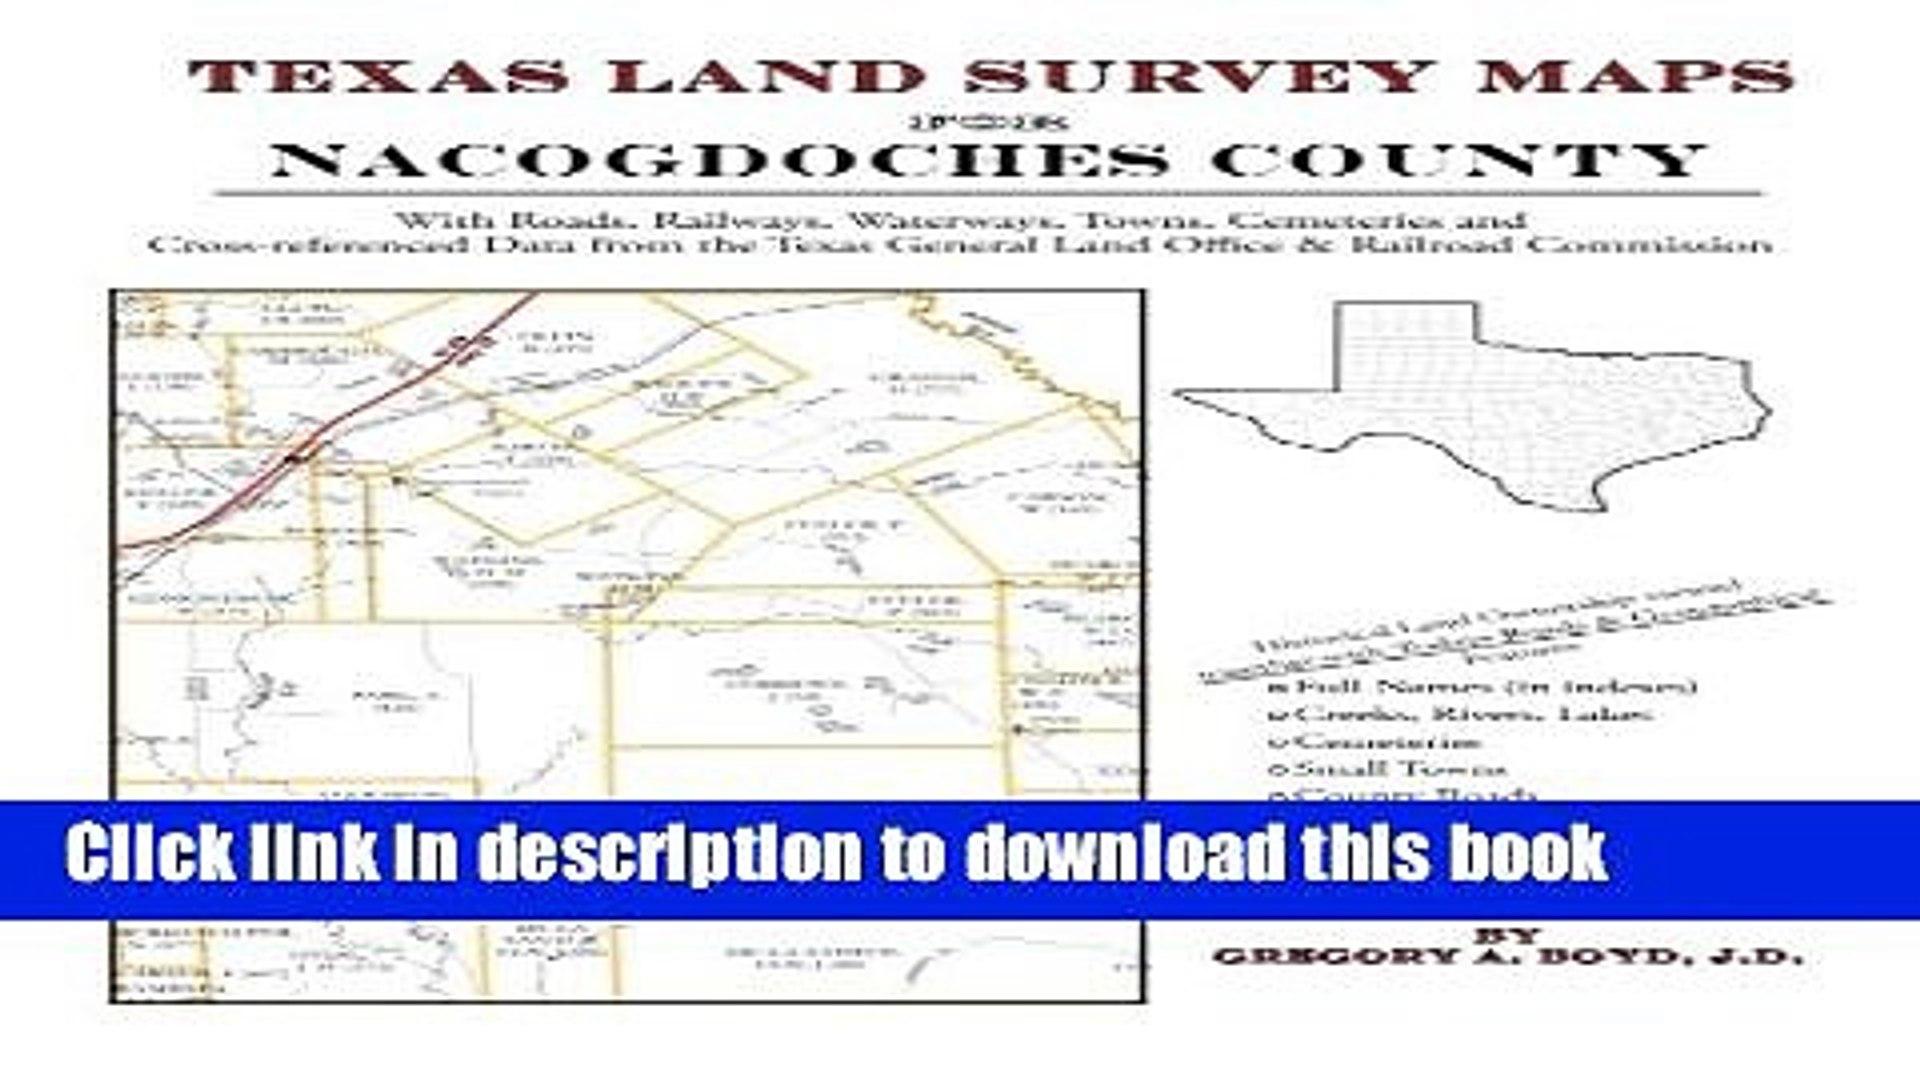 Pdf] Texas Land Survey Maps For Nacogdoches County Download Online - Texas Land Survey Maps